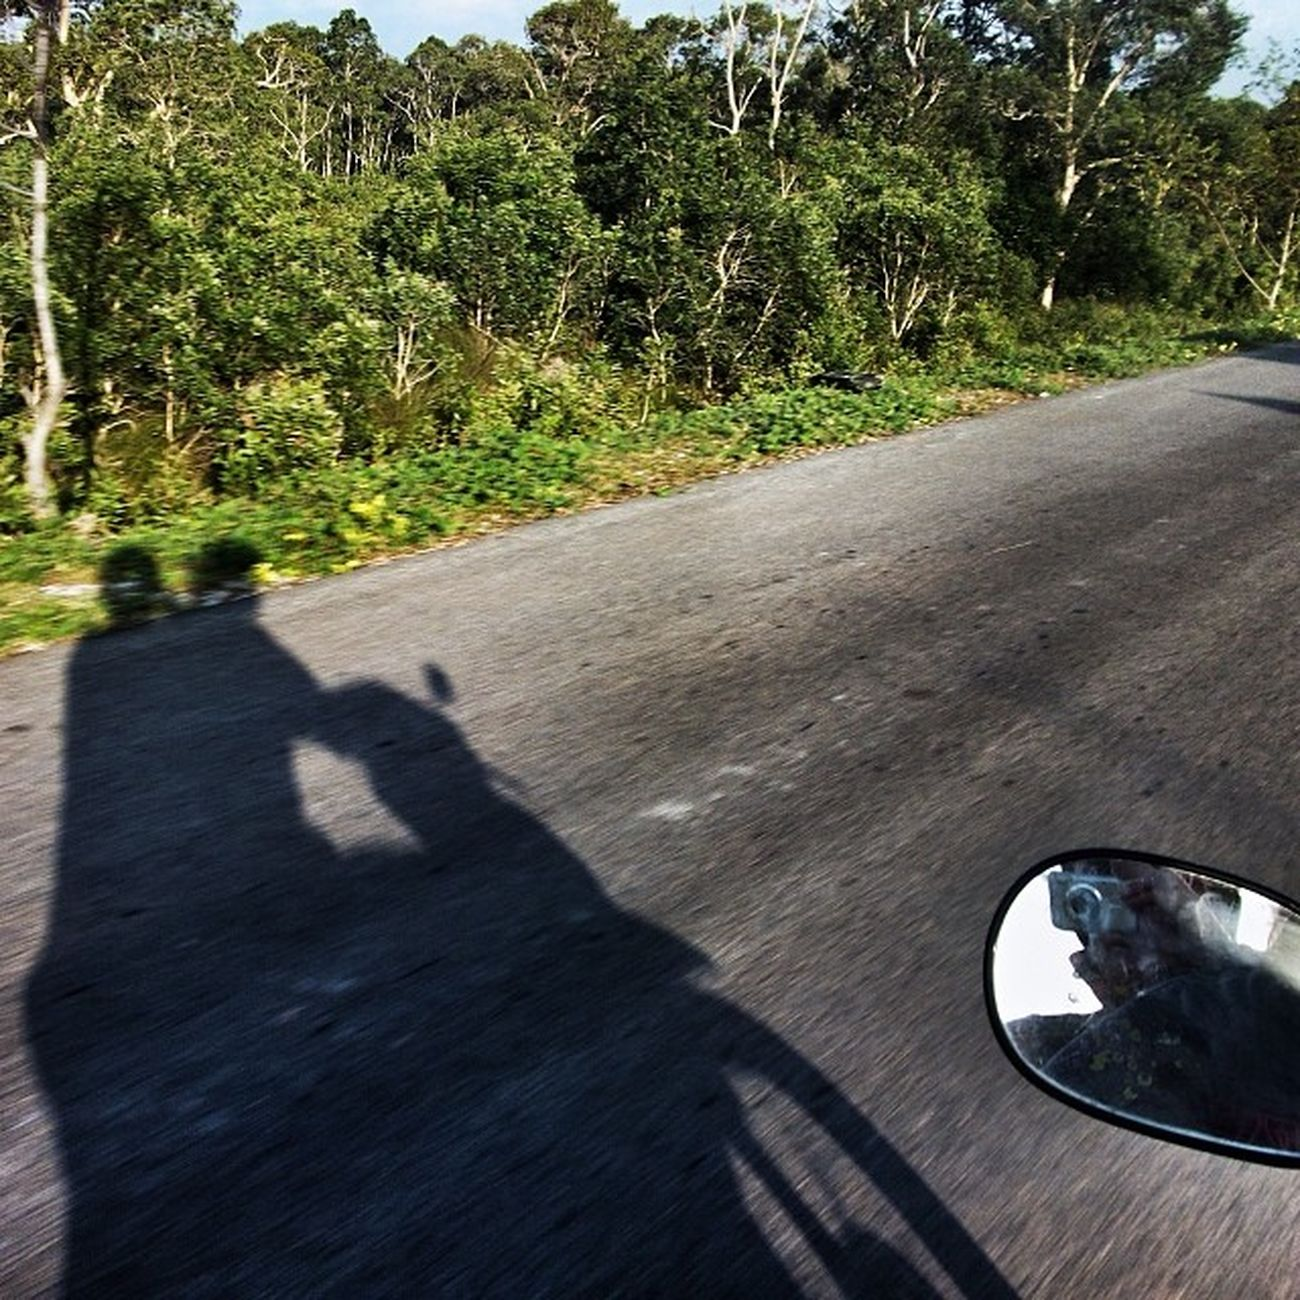 Bike Shadow Road Rearviewmirror jungleroad free